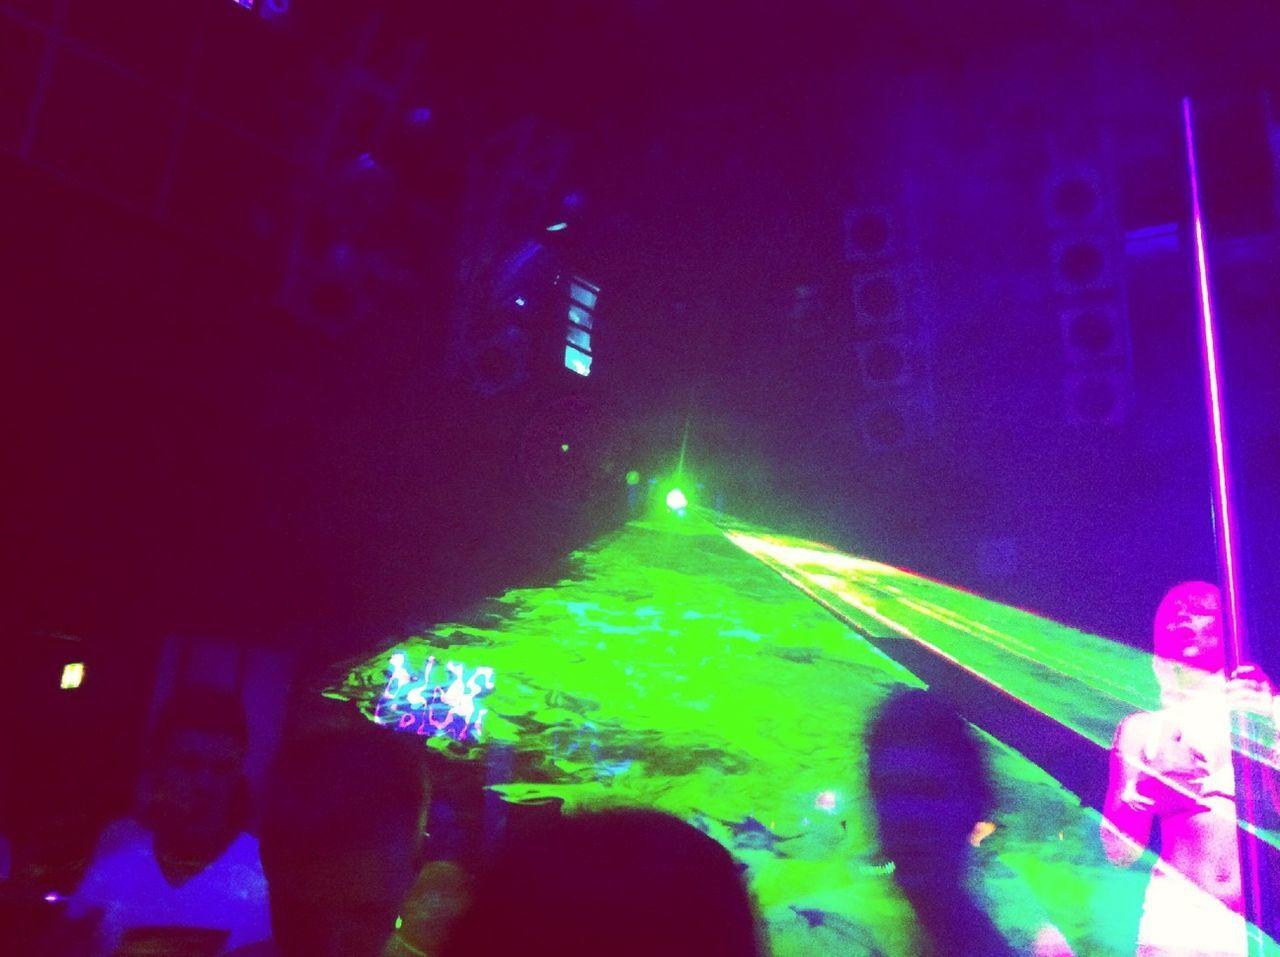 illuminated, night, lighting equipment, hanging, glowing, nightclub, enjoyment, blue, nightlife, light, light beam, electric light, multi colored, party - social event, dark, sky, event, vibrant color